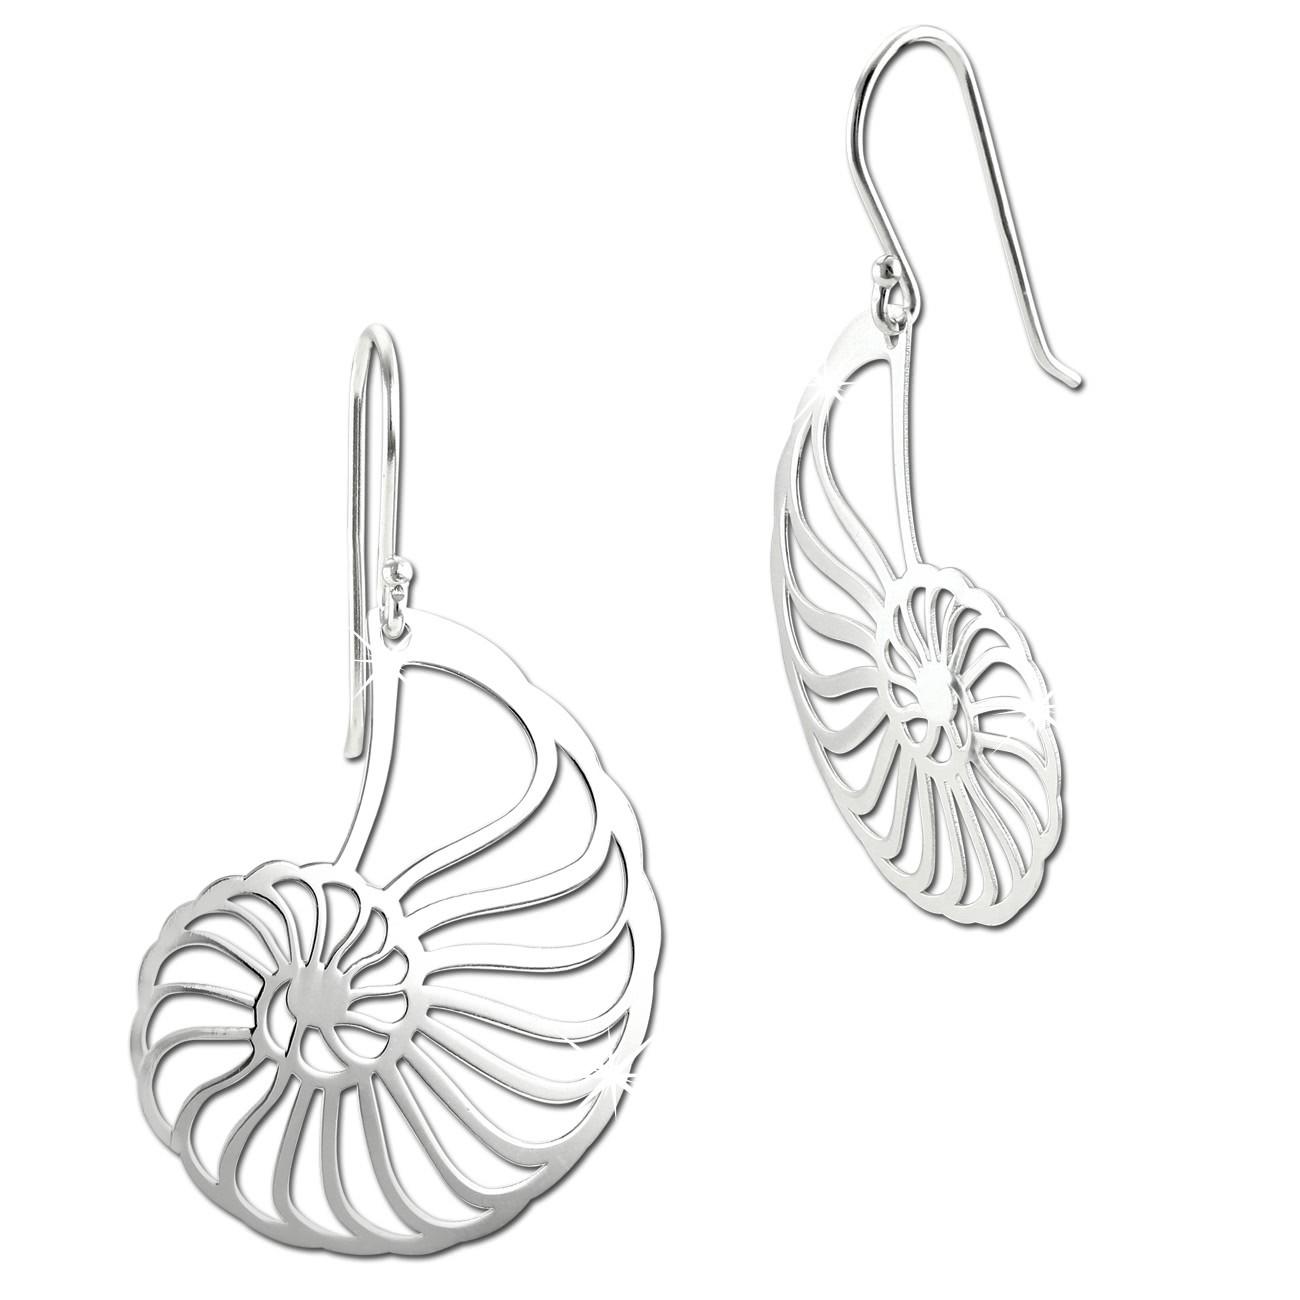 SilberDream Ohrringe Nautilus Muschel 925er Silber Damen Ohrhänger SDO8818J